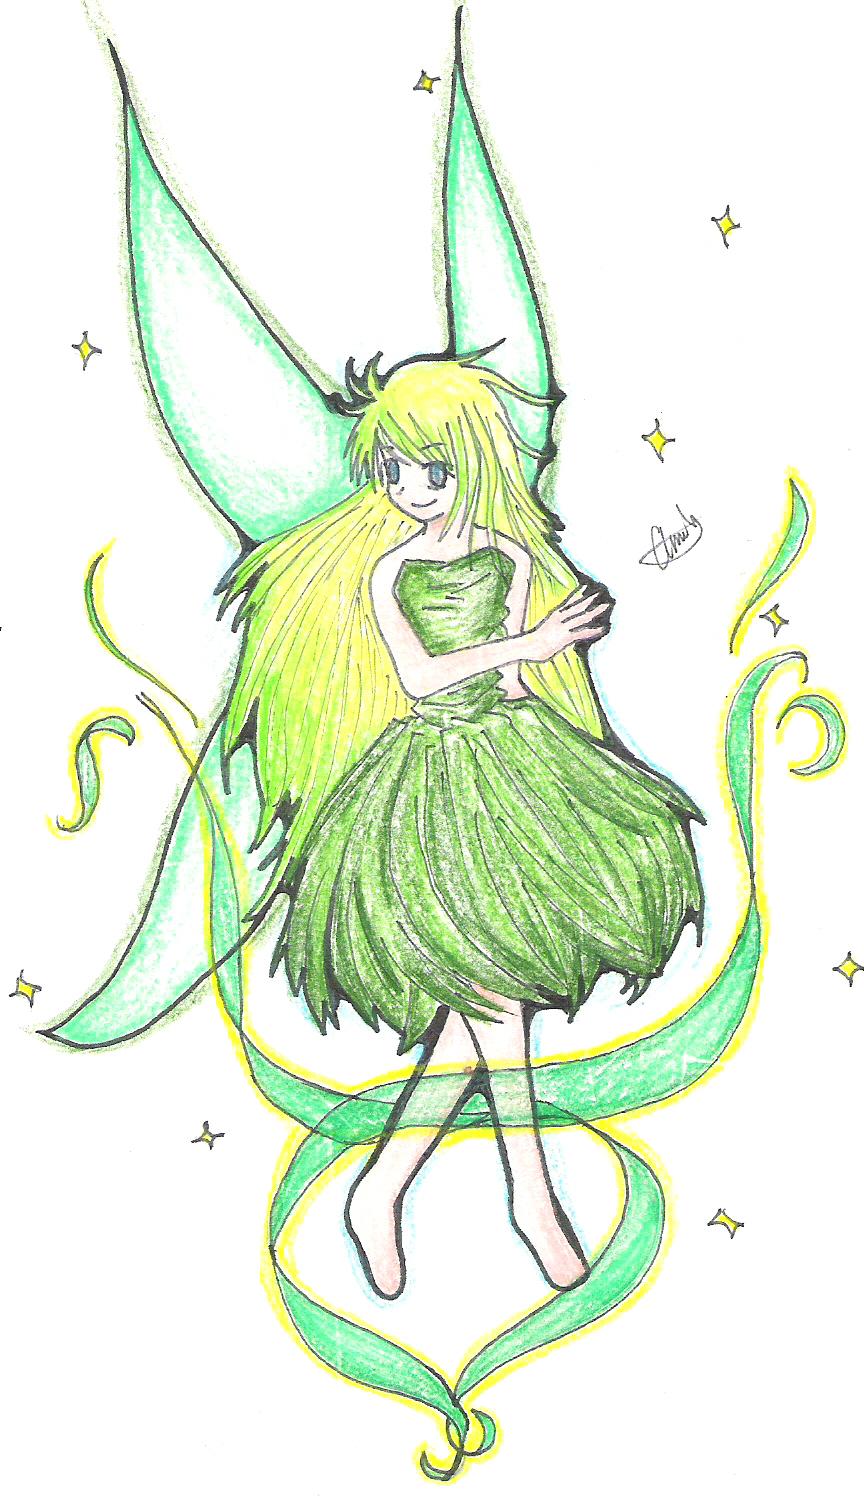 earth fairy by azulhearts on DeviantArt